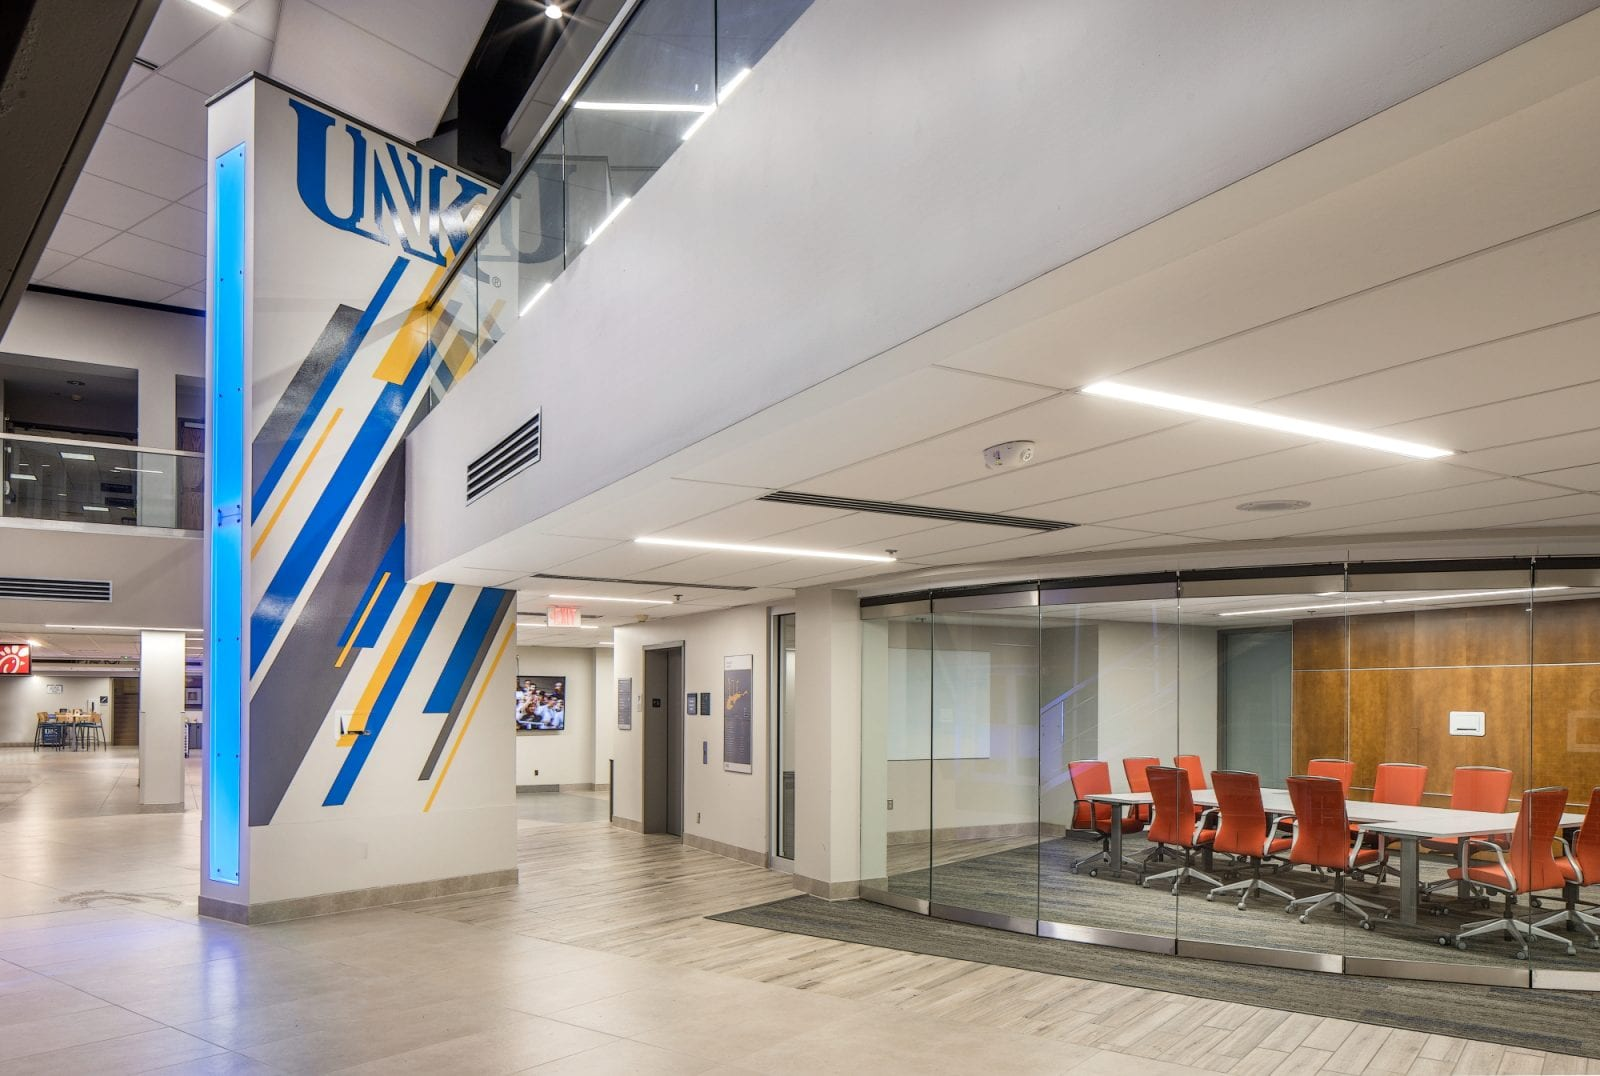 UNK Nebraskan Student Union